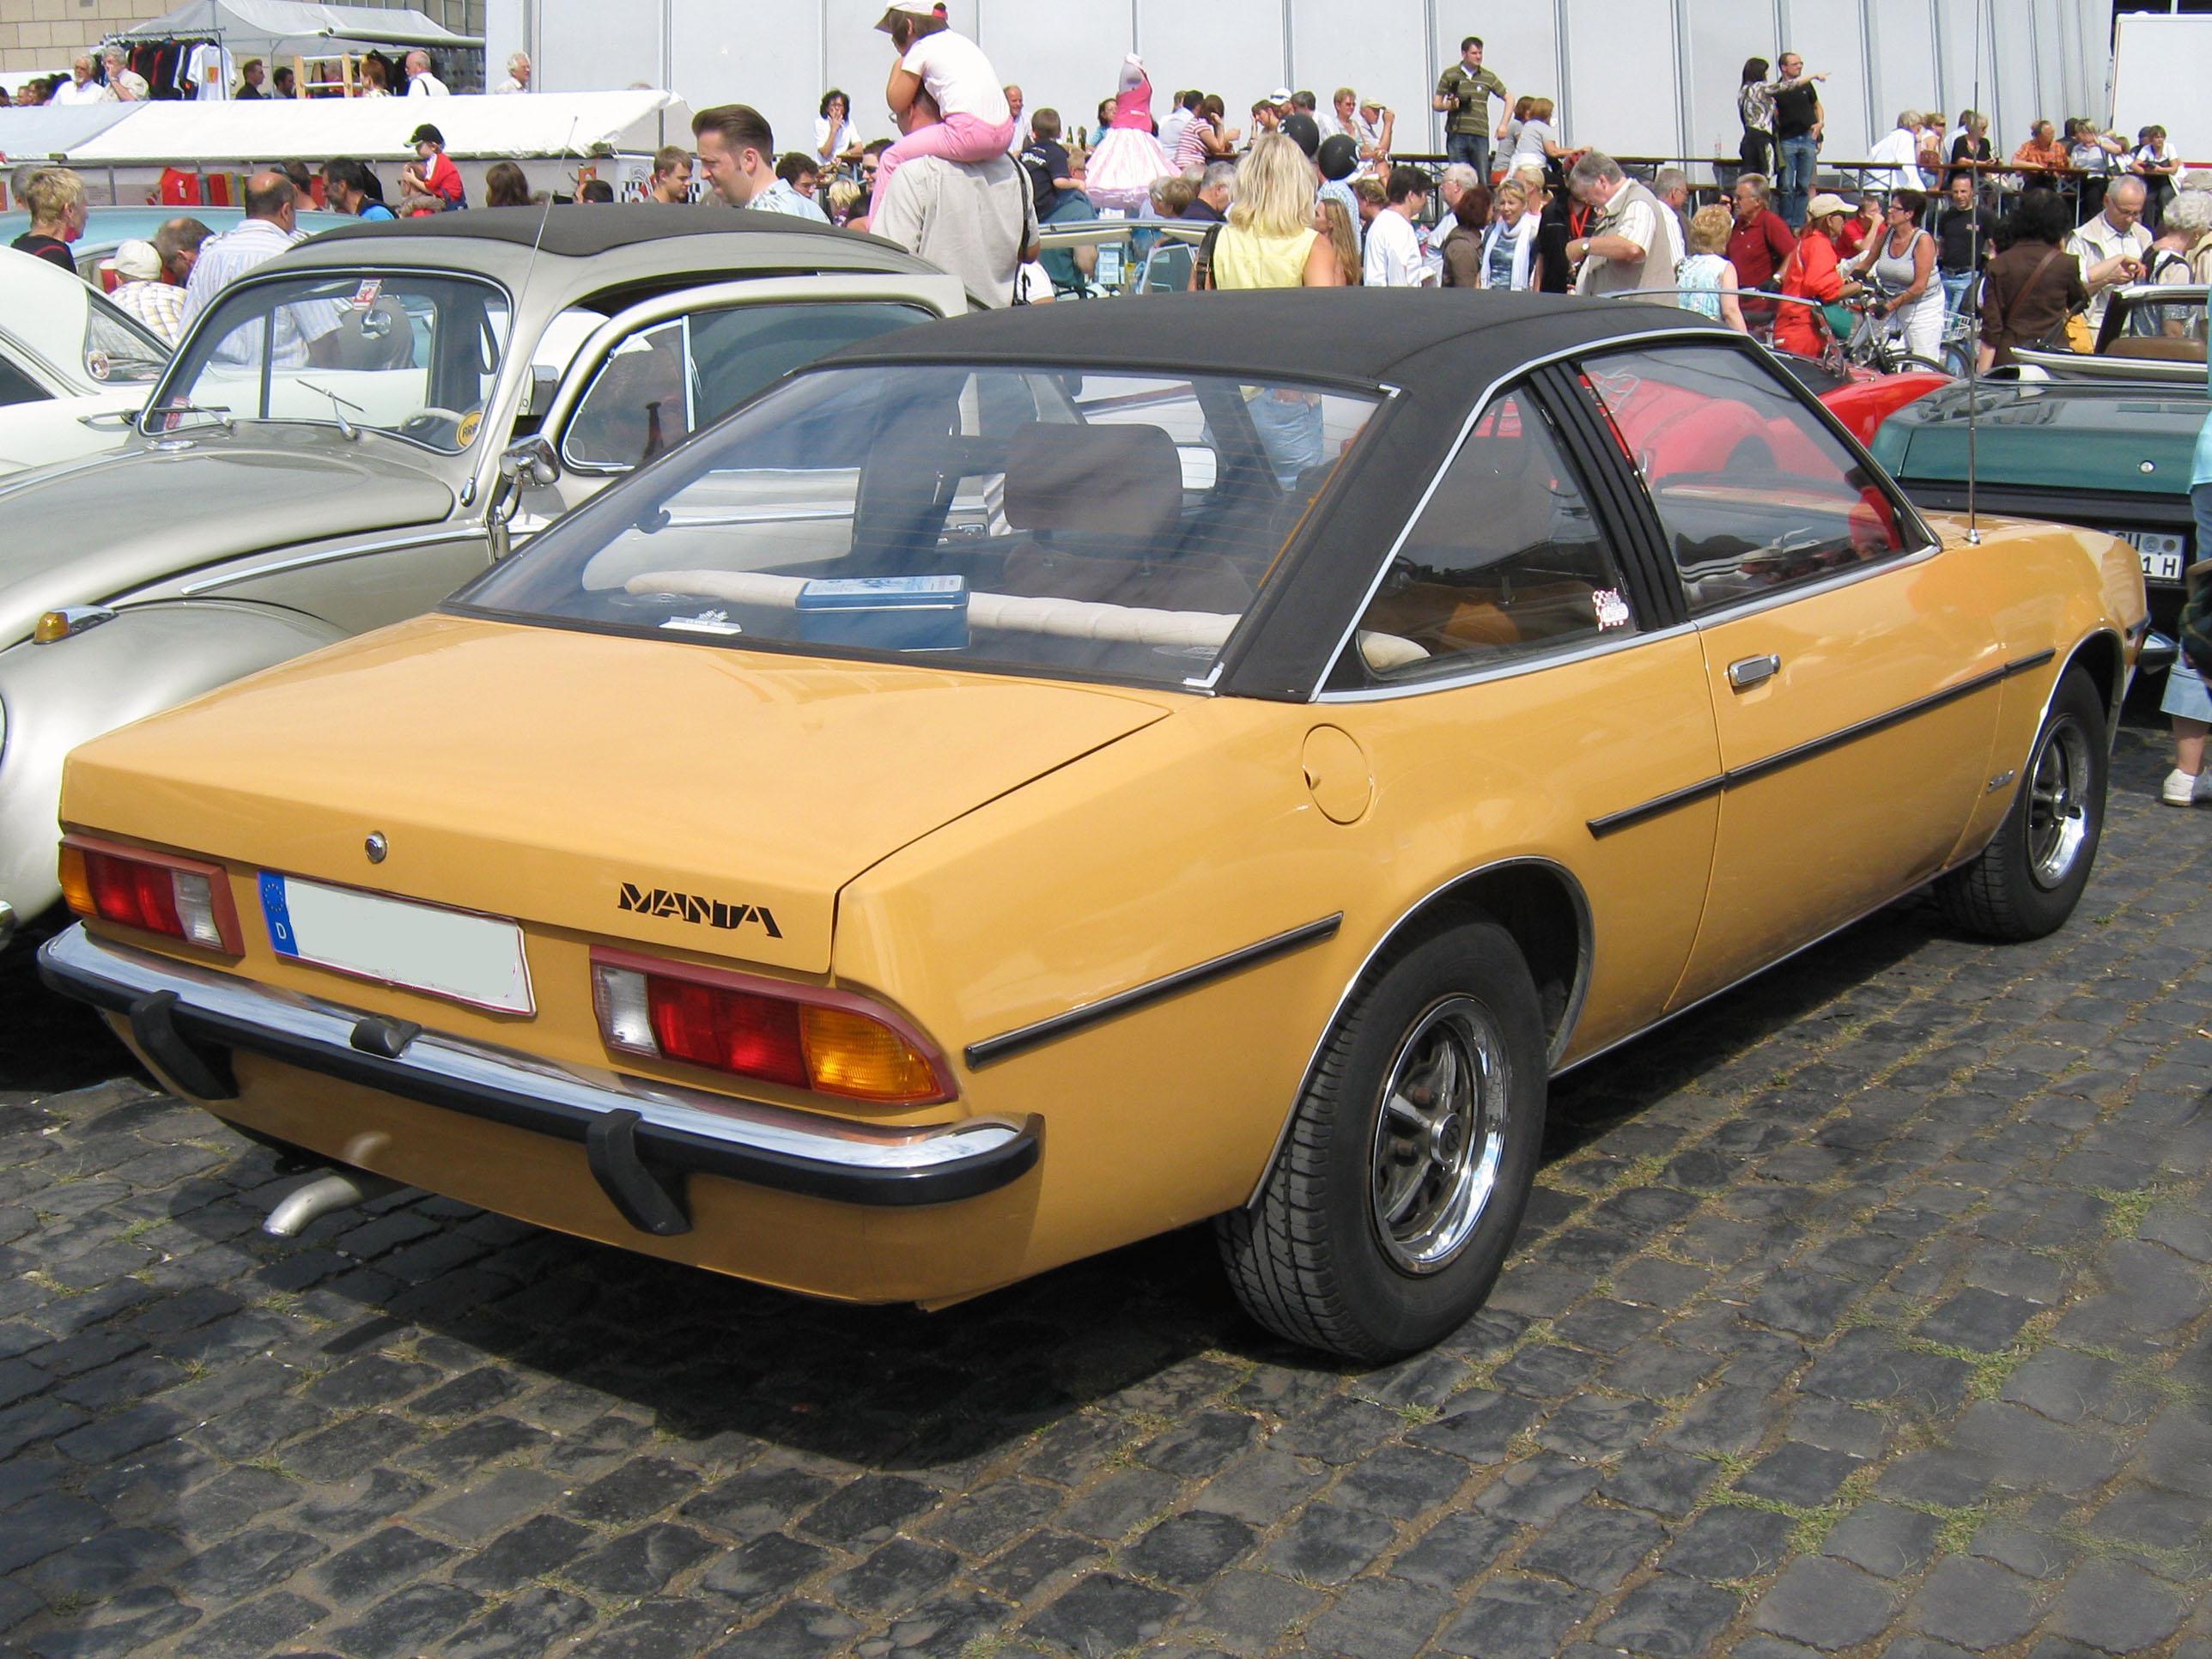 Opel Manta B >> File:1975 Opel Manta B Heck.jpg - Wikipedia